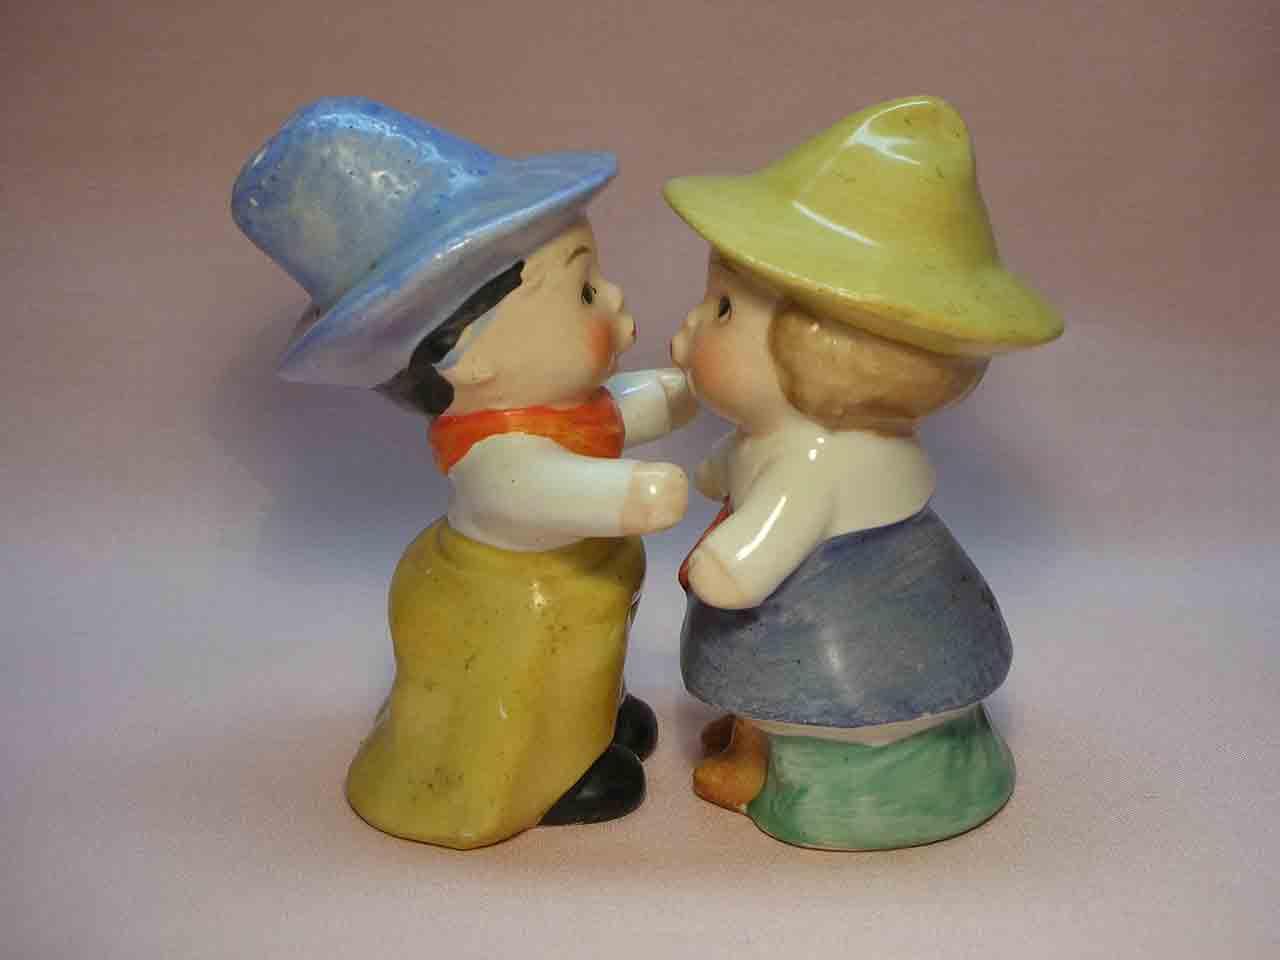 Goebel huggers salt and pepper shakers - cowboys